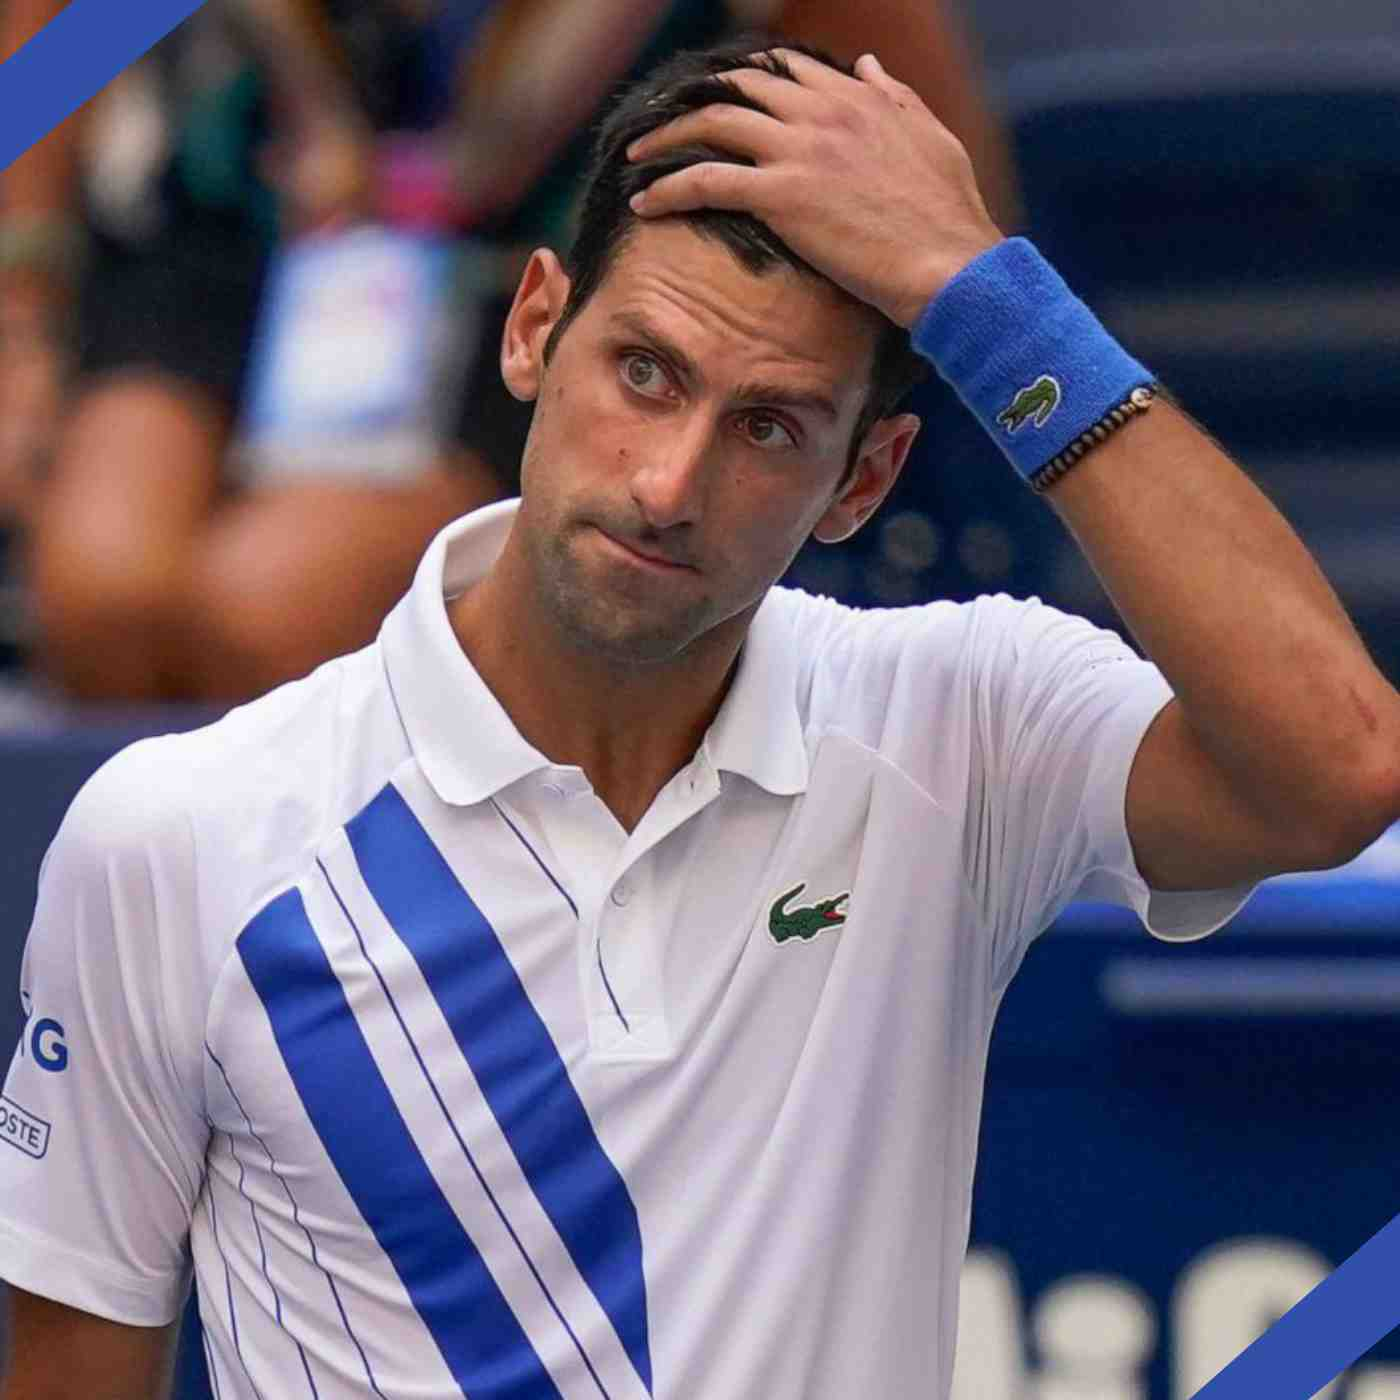 Why Djokovic Gets no Love